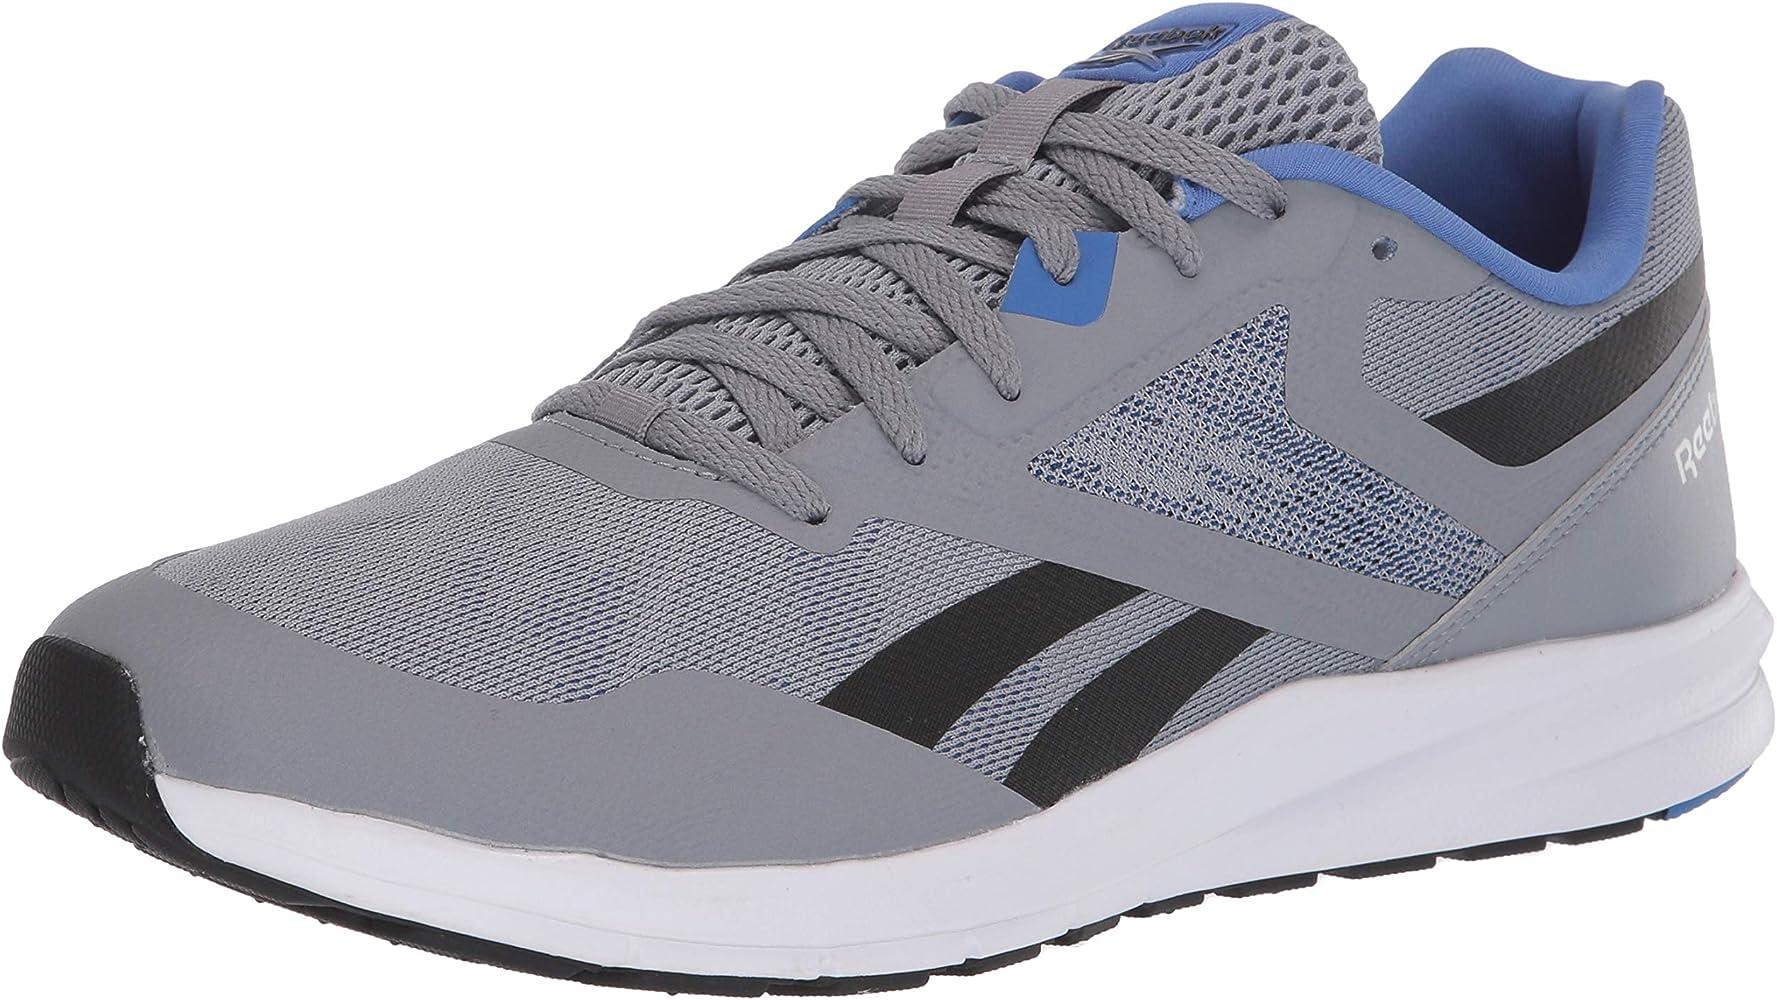 Reebok Men's Runner 4.0 Running Shoe